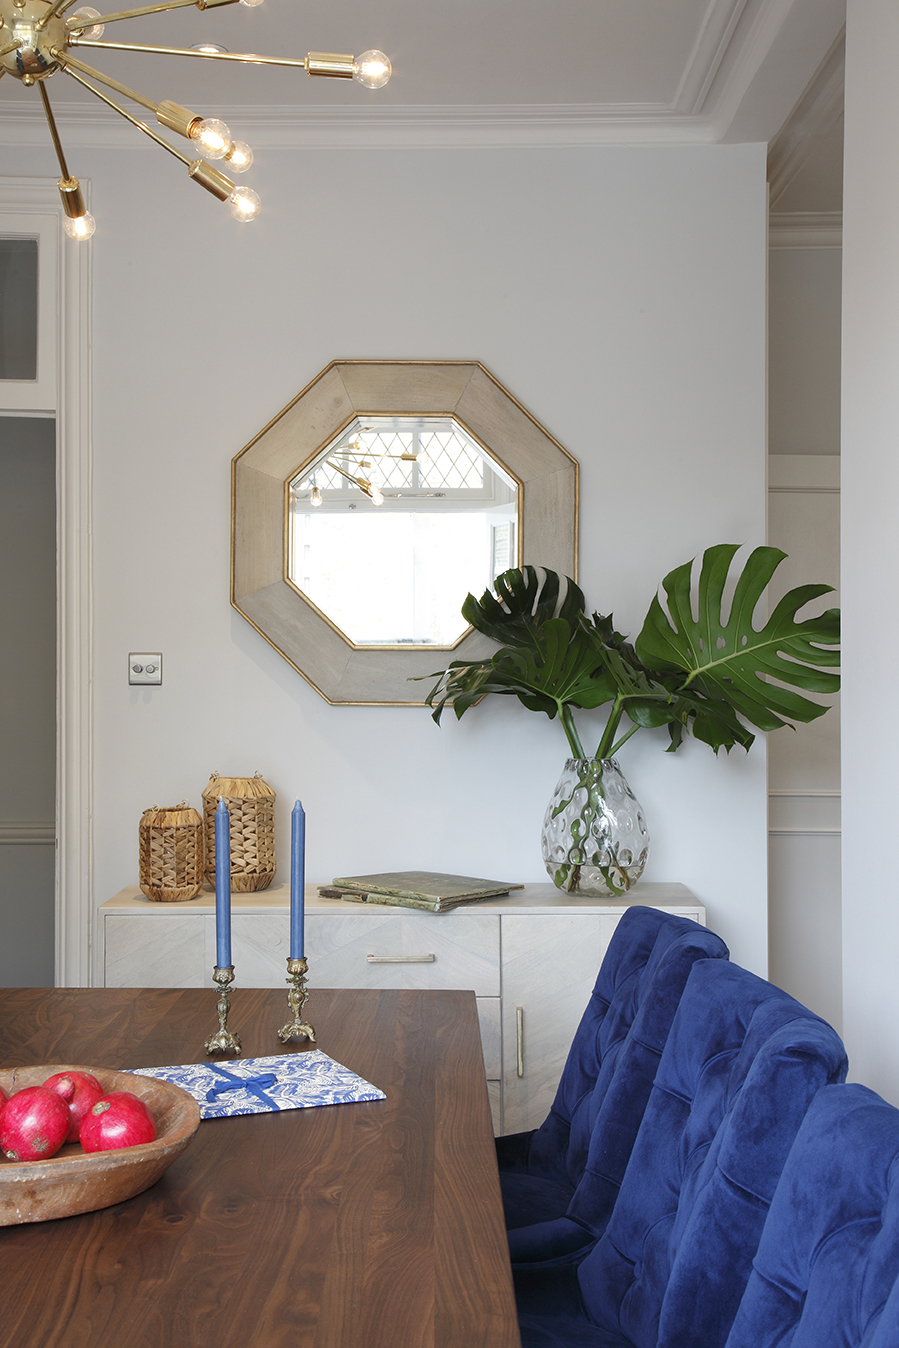 NW1 - Dining room - Displaying sideboard & octangular mirror.jpg